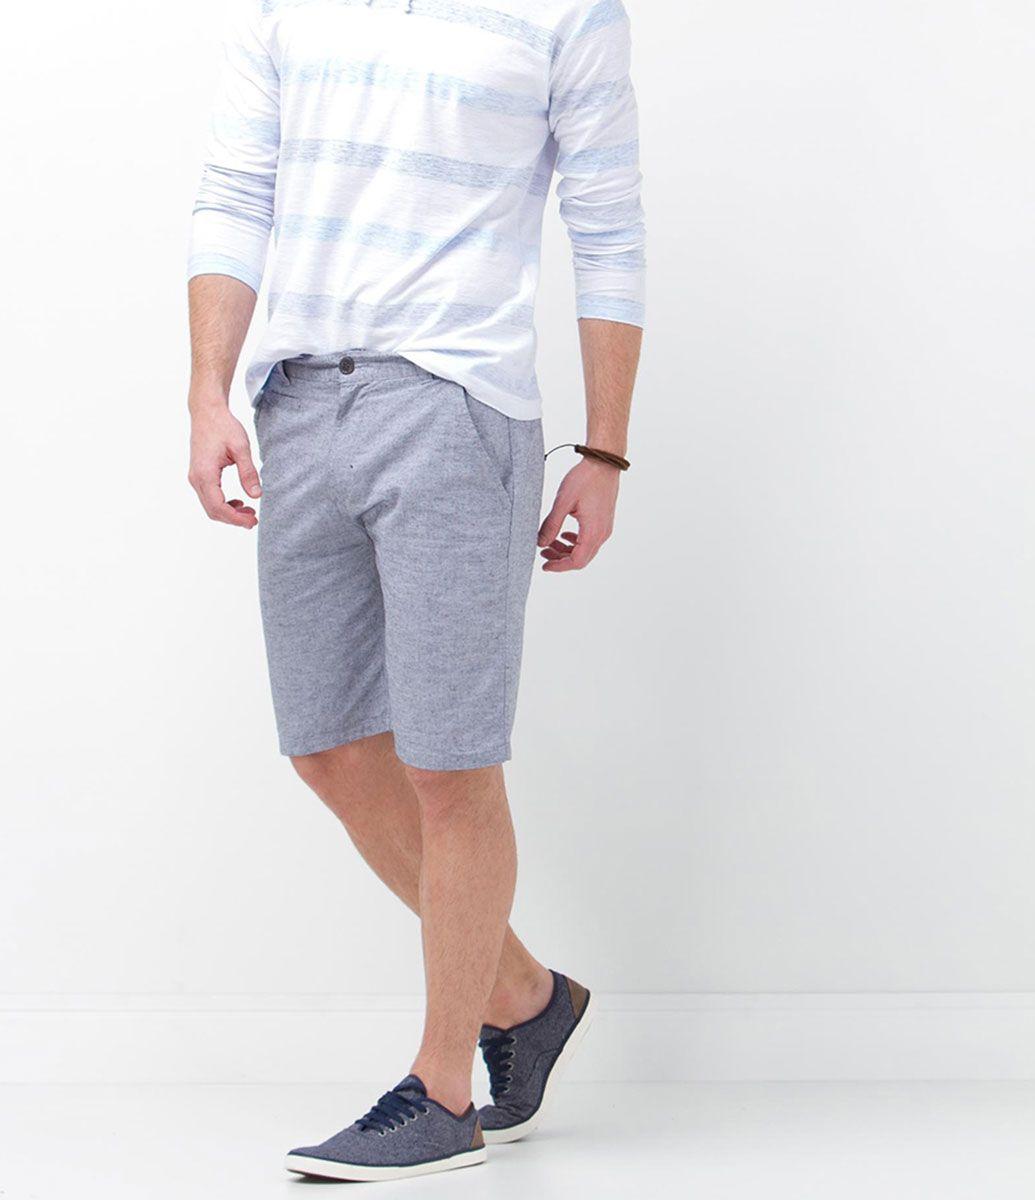 d636a3ceeed6 Bermuda Masculina em algodão - Lojas Renner | Urban | Bermudas ...